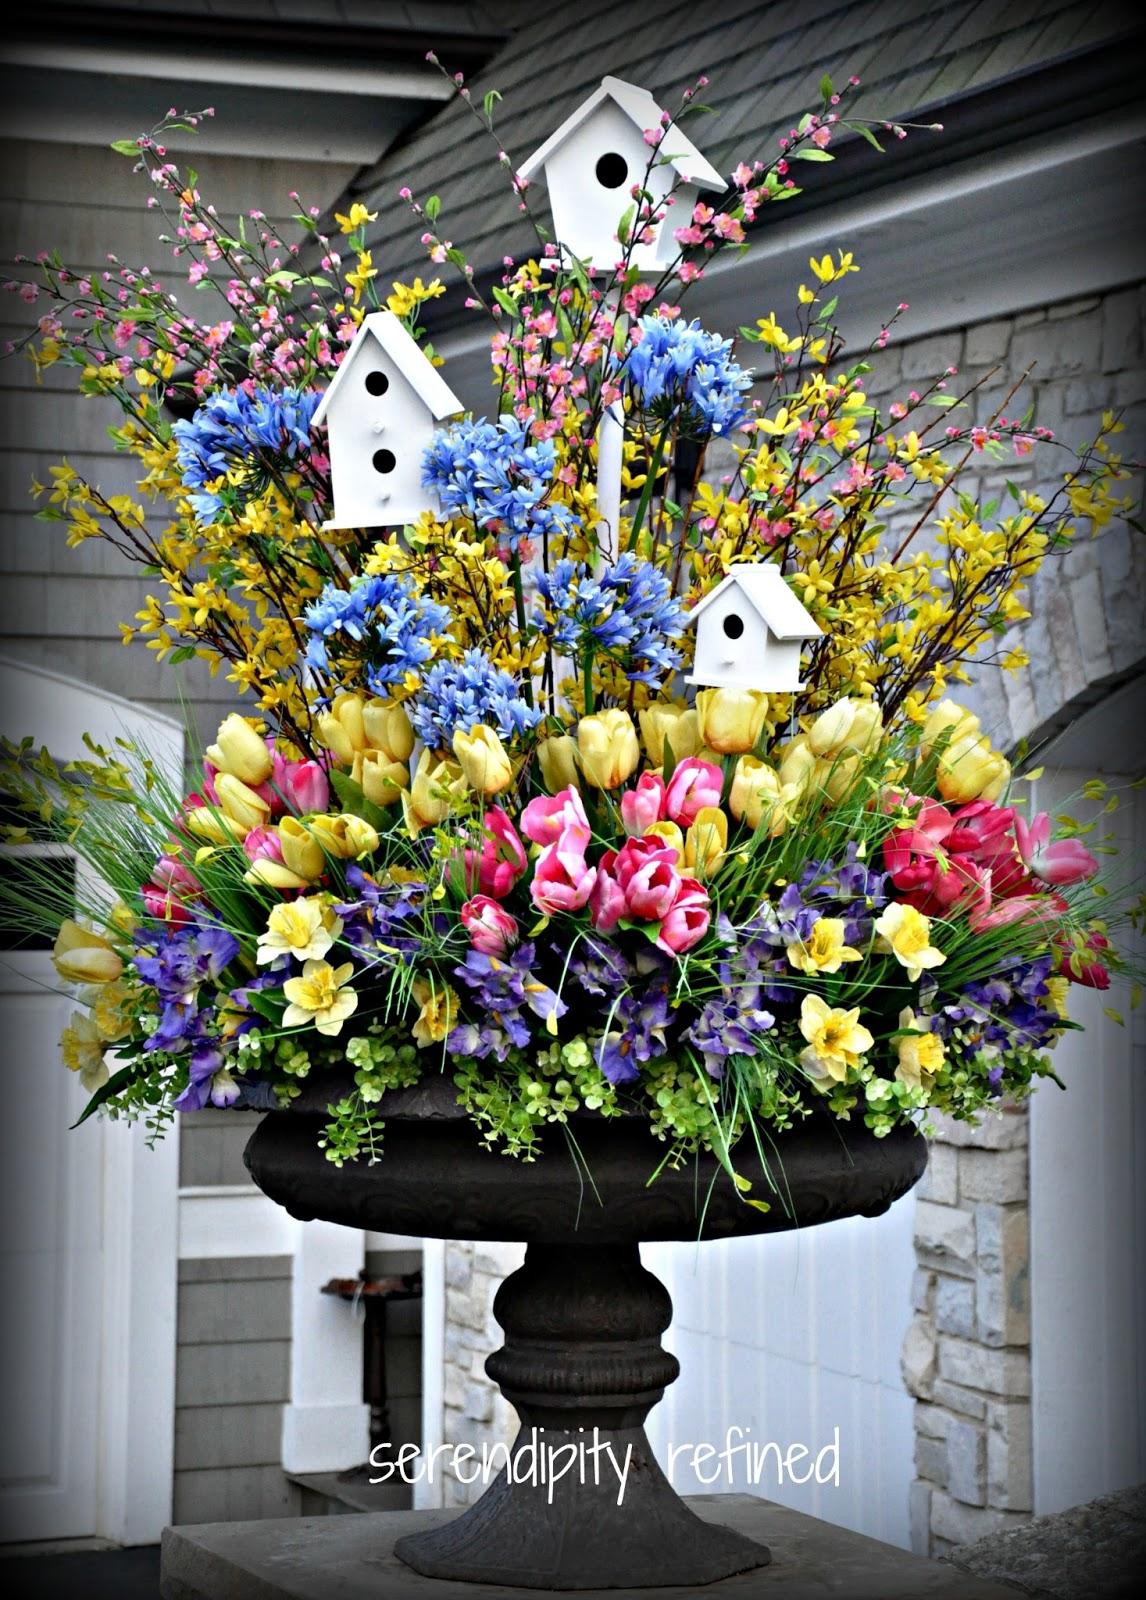 Serendipity refined blog spring urn planter tulips for House arrangement ideas